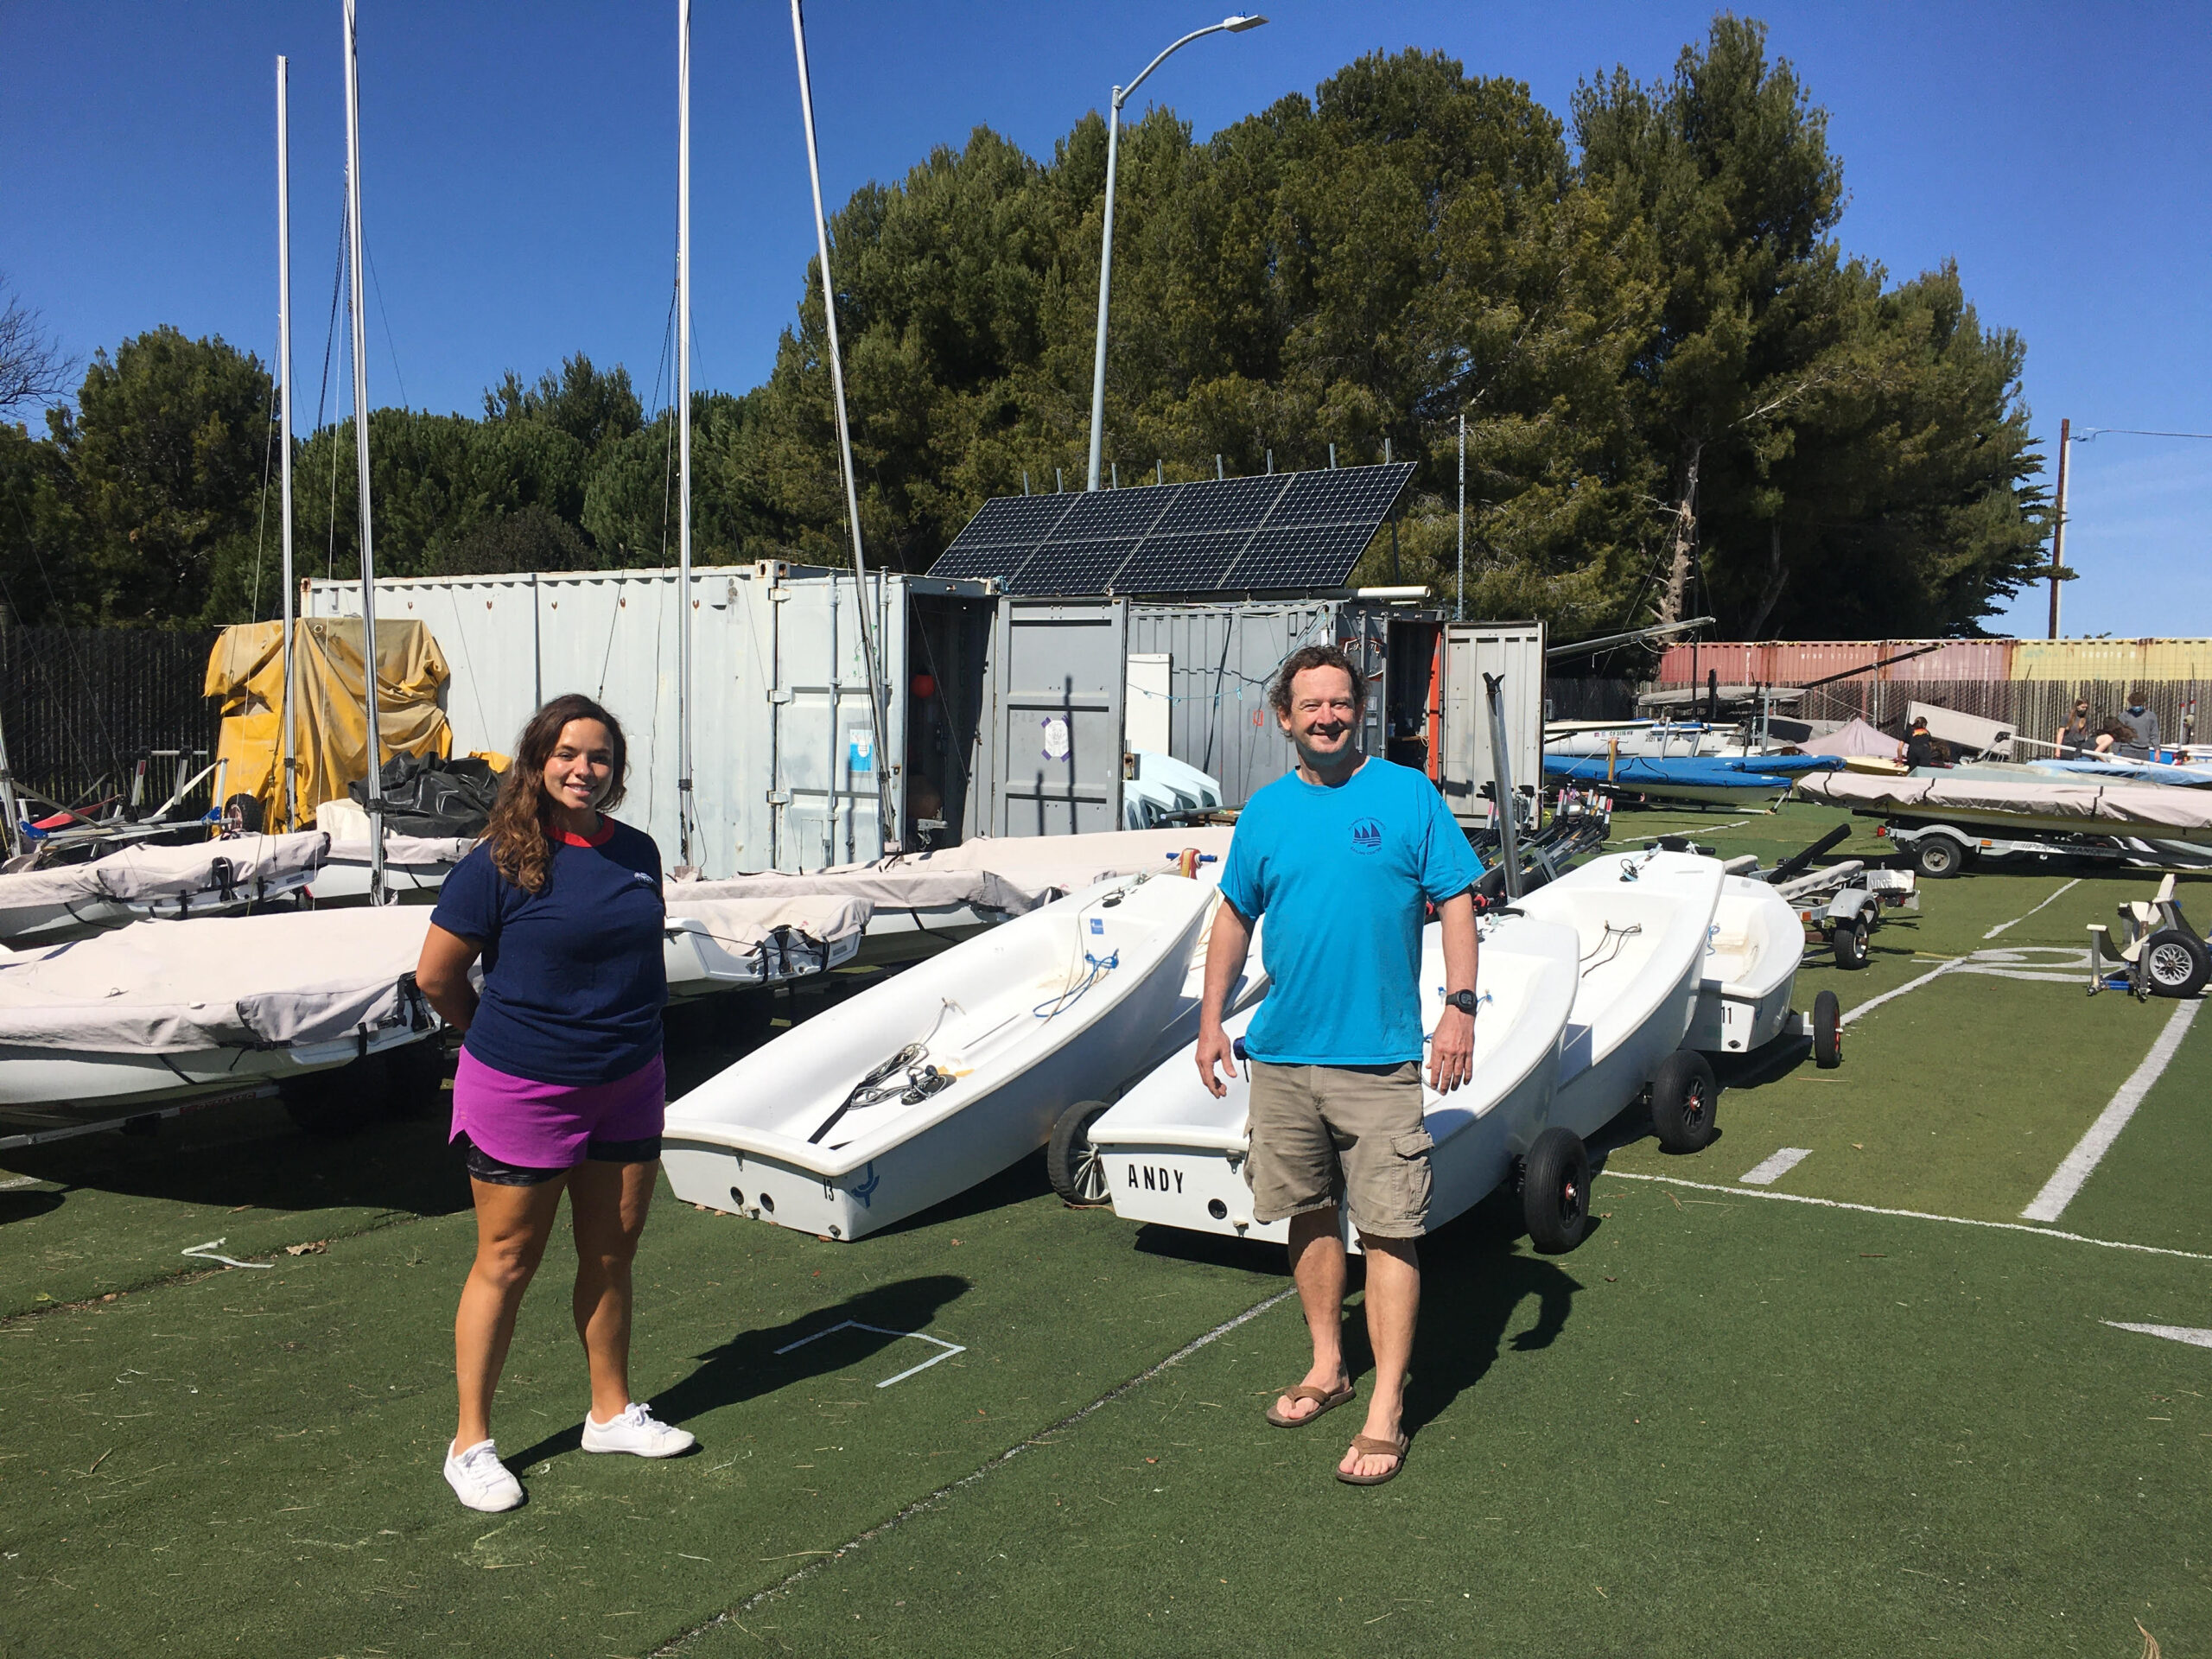 Alameda Community Sailing Center Aims to Keep Sailors Active